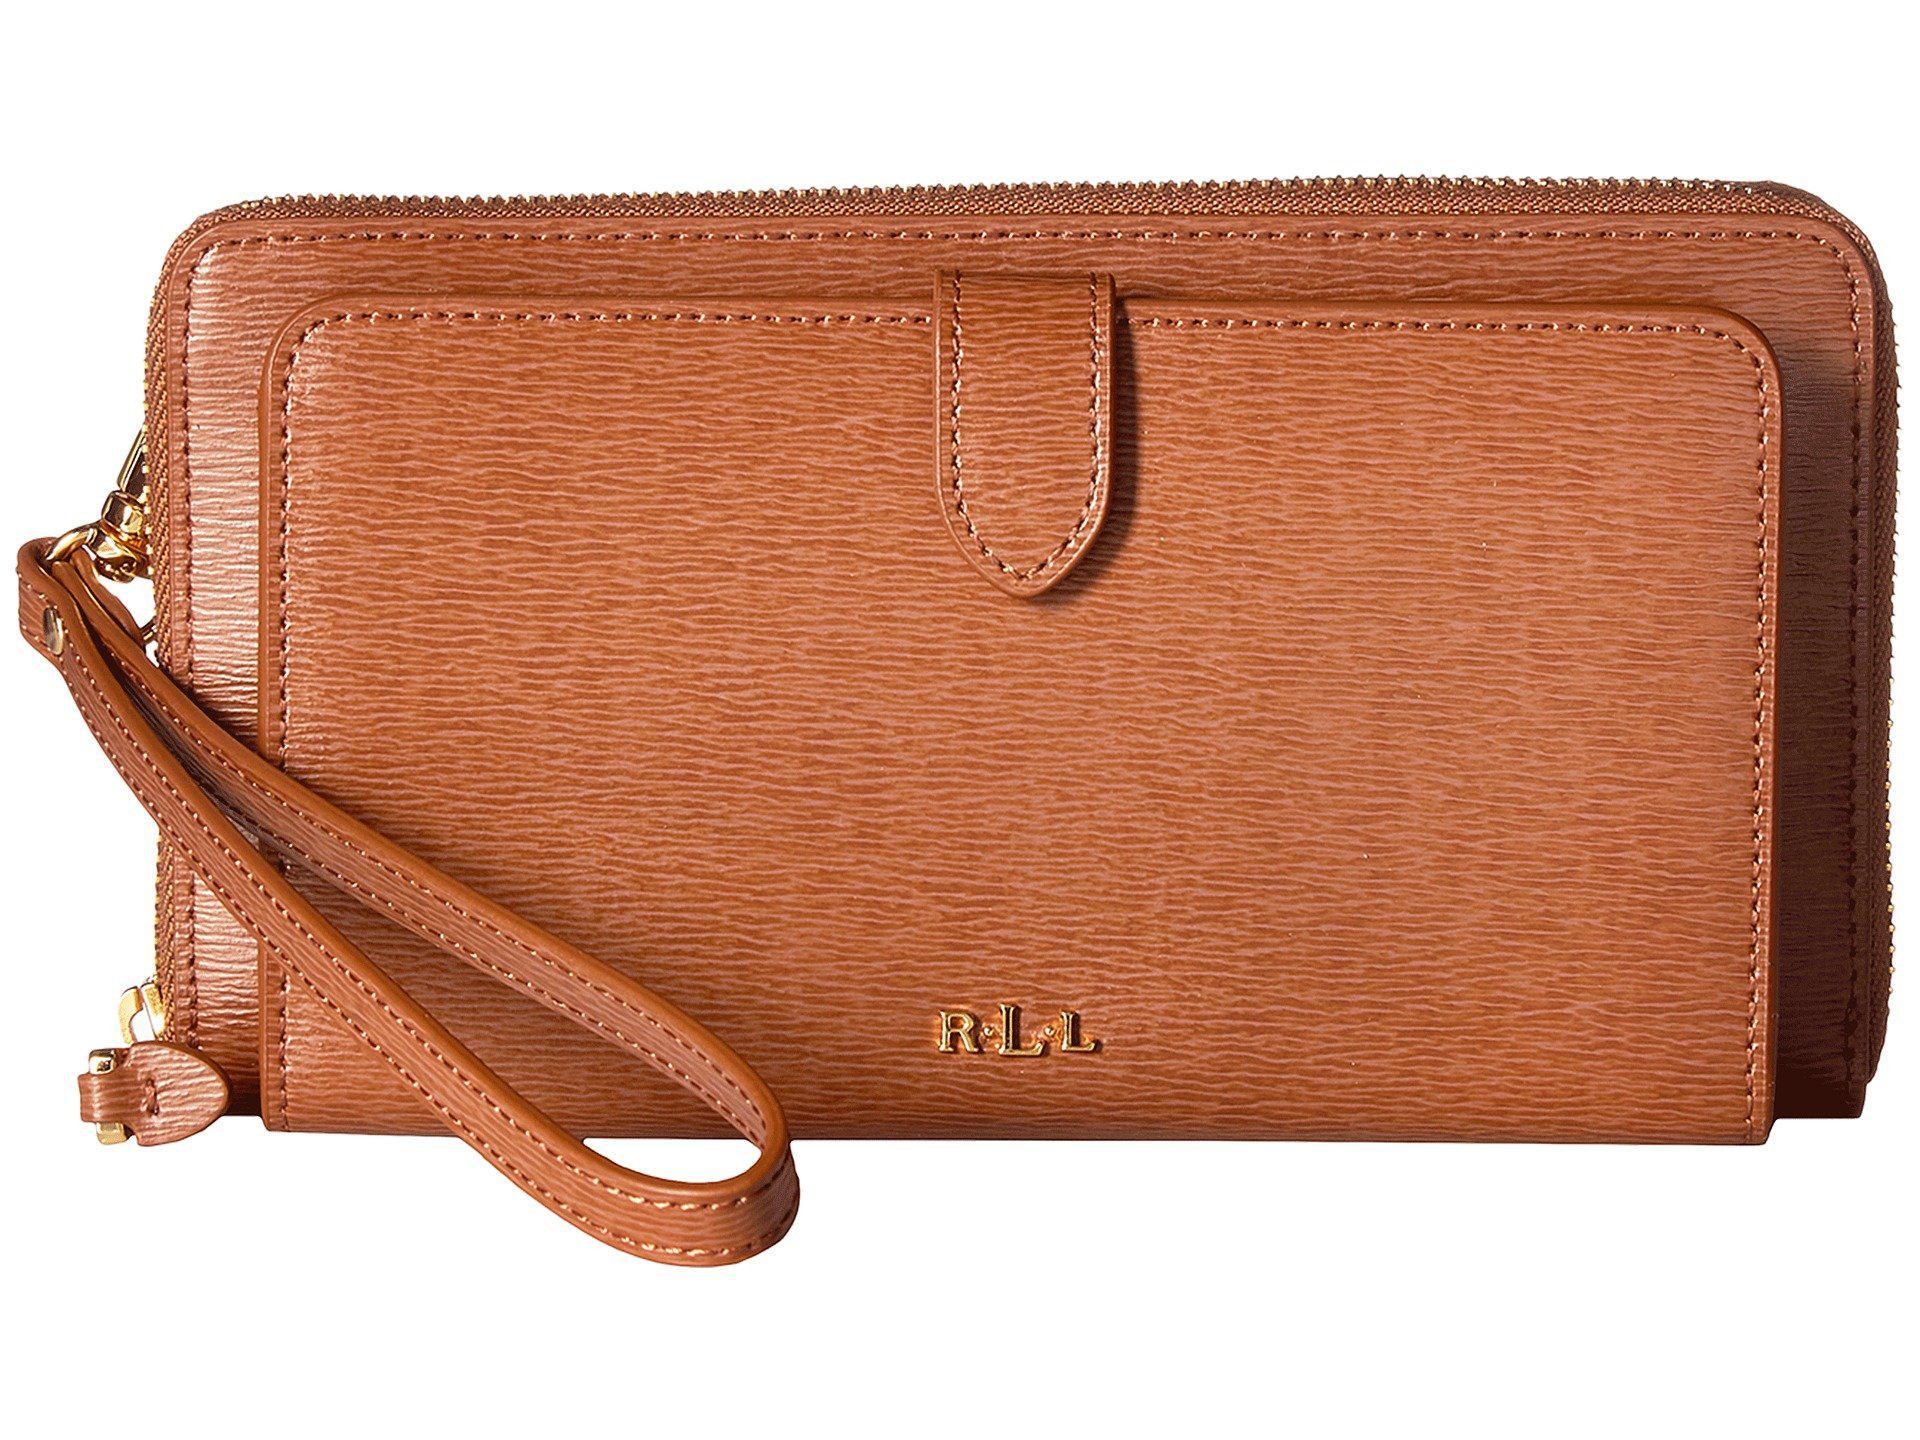 6b5316239fb7 Lyst - Lauren by Ralph Lauren Newbury Everything Wristlet in Brown